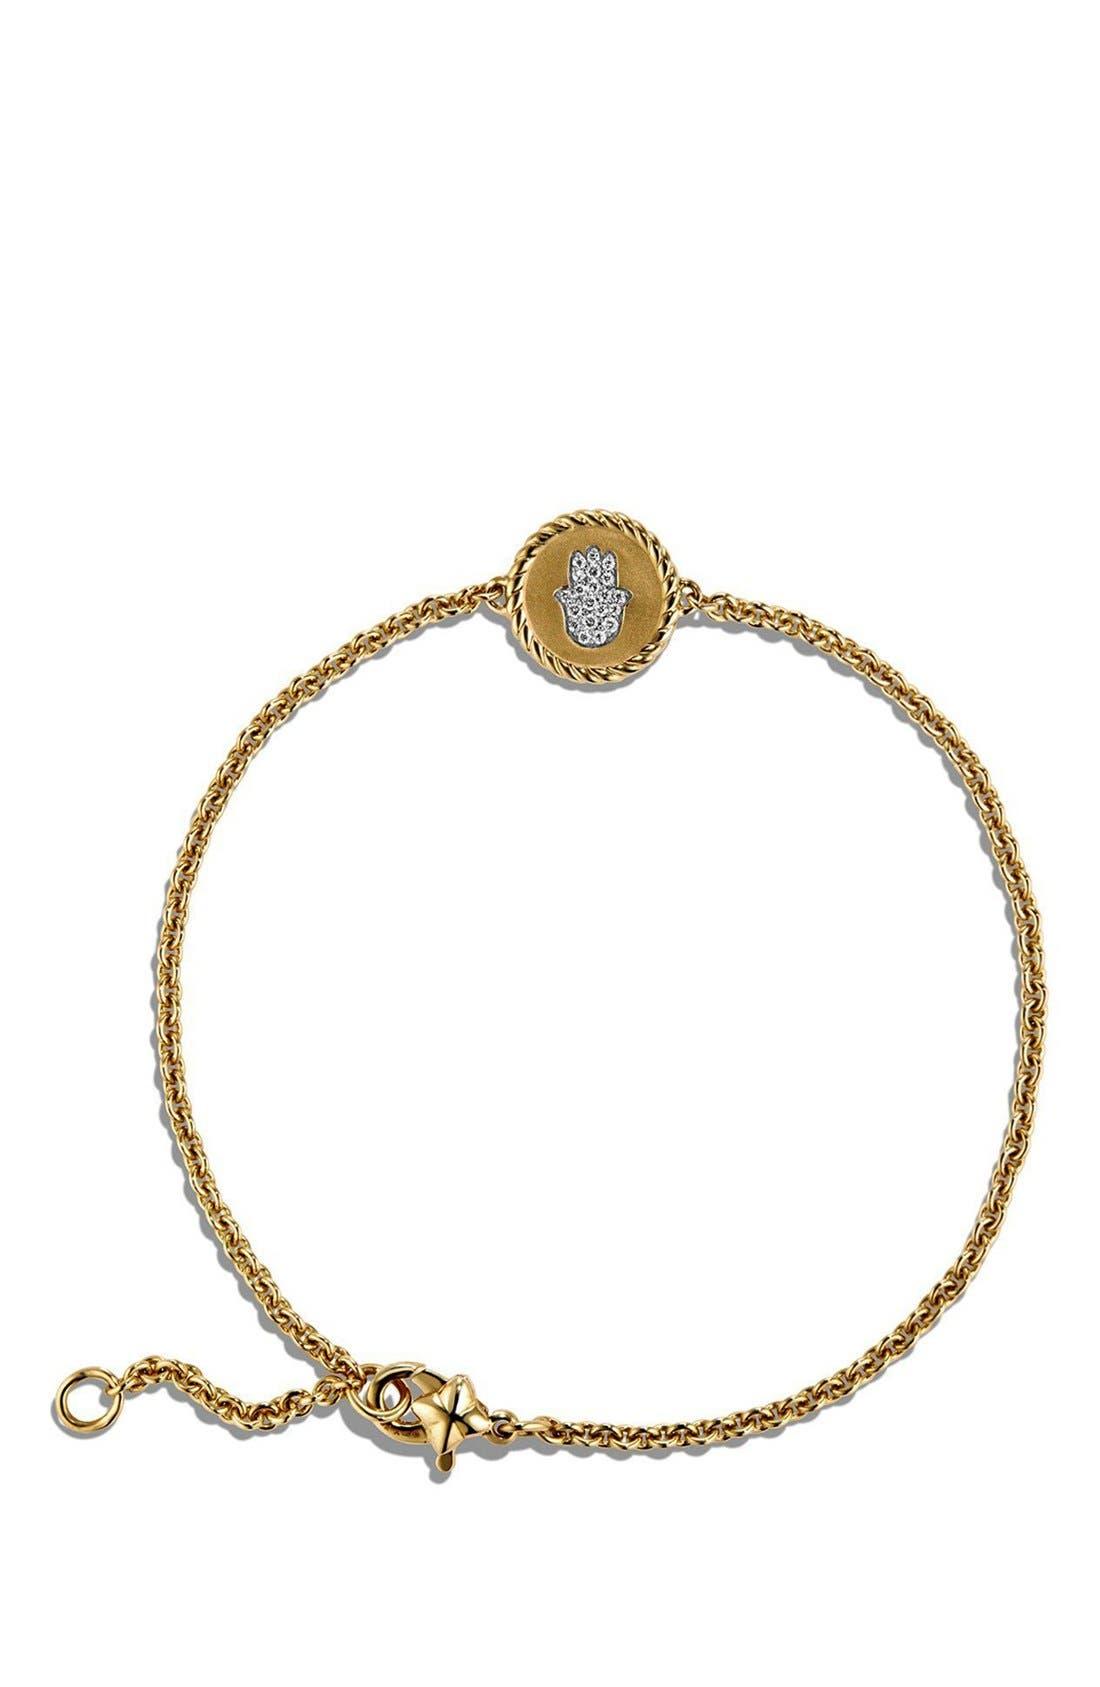 'Petite Pavé' Hamsa Bracelet with Diamonds in 18K Gold,                             Alternate thumbnail 3, color,                             GOLD